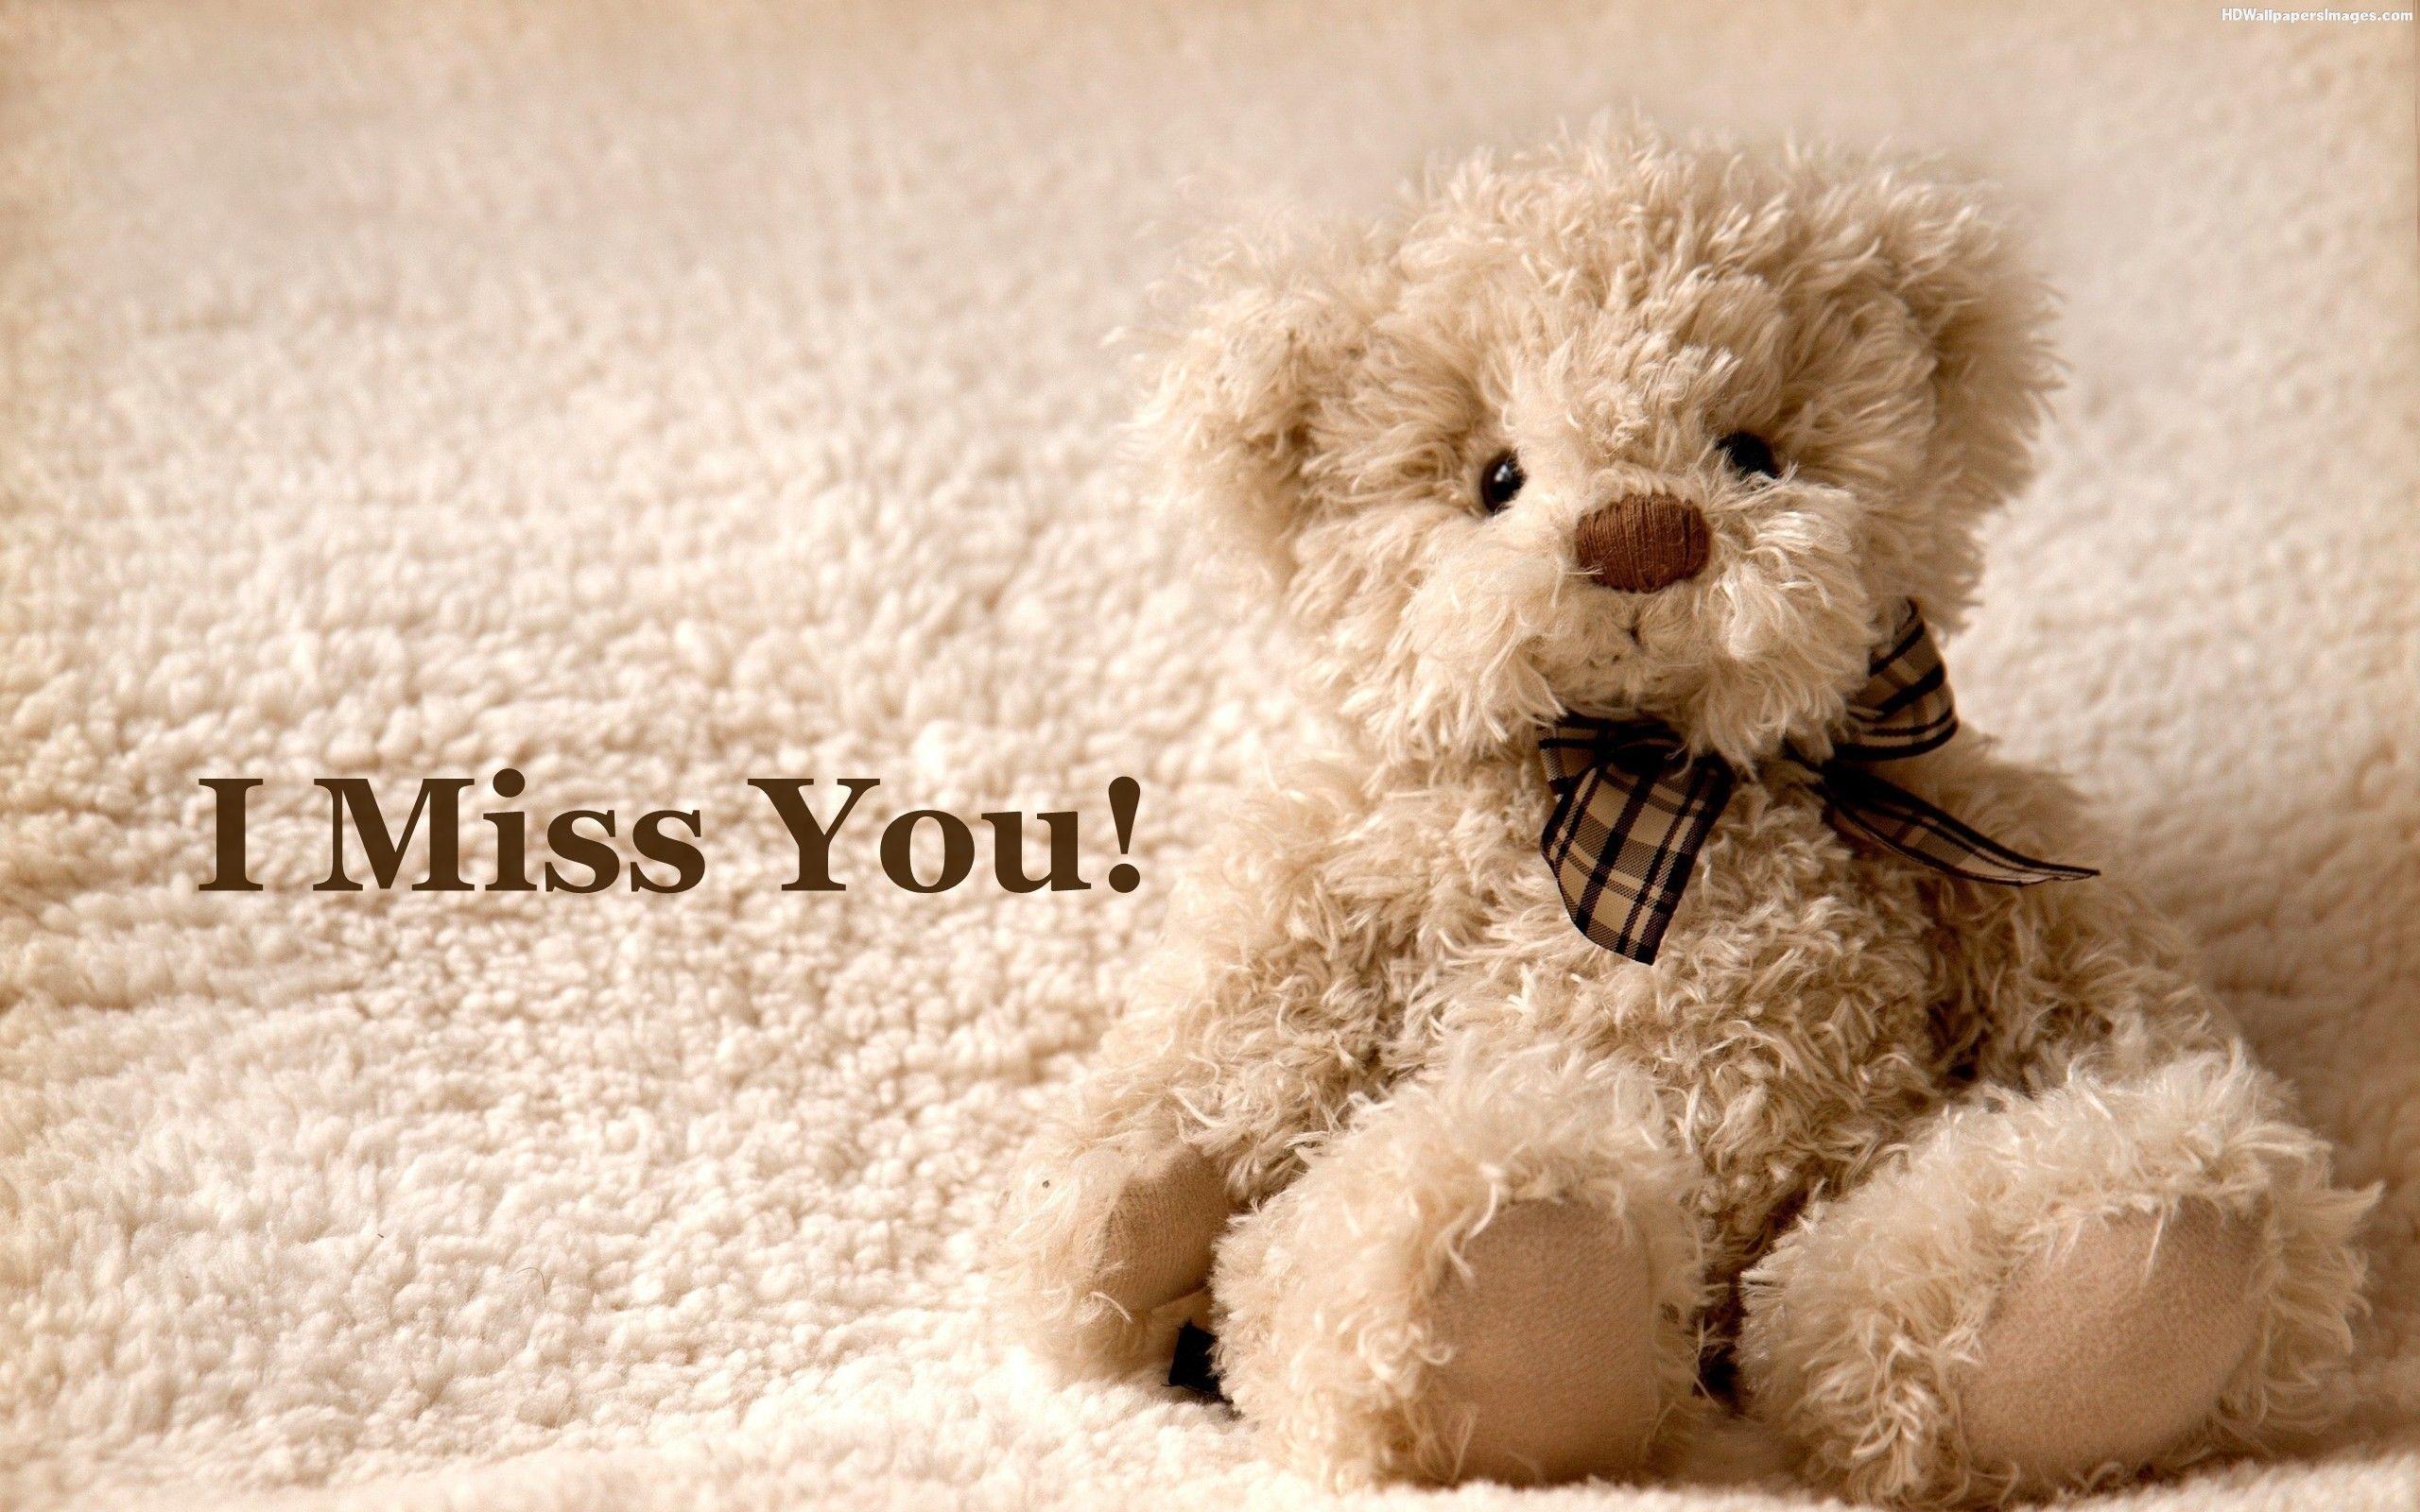 I Miss You Cute Teddy Bear HD Wallpaper